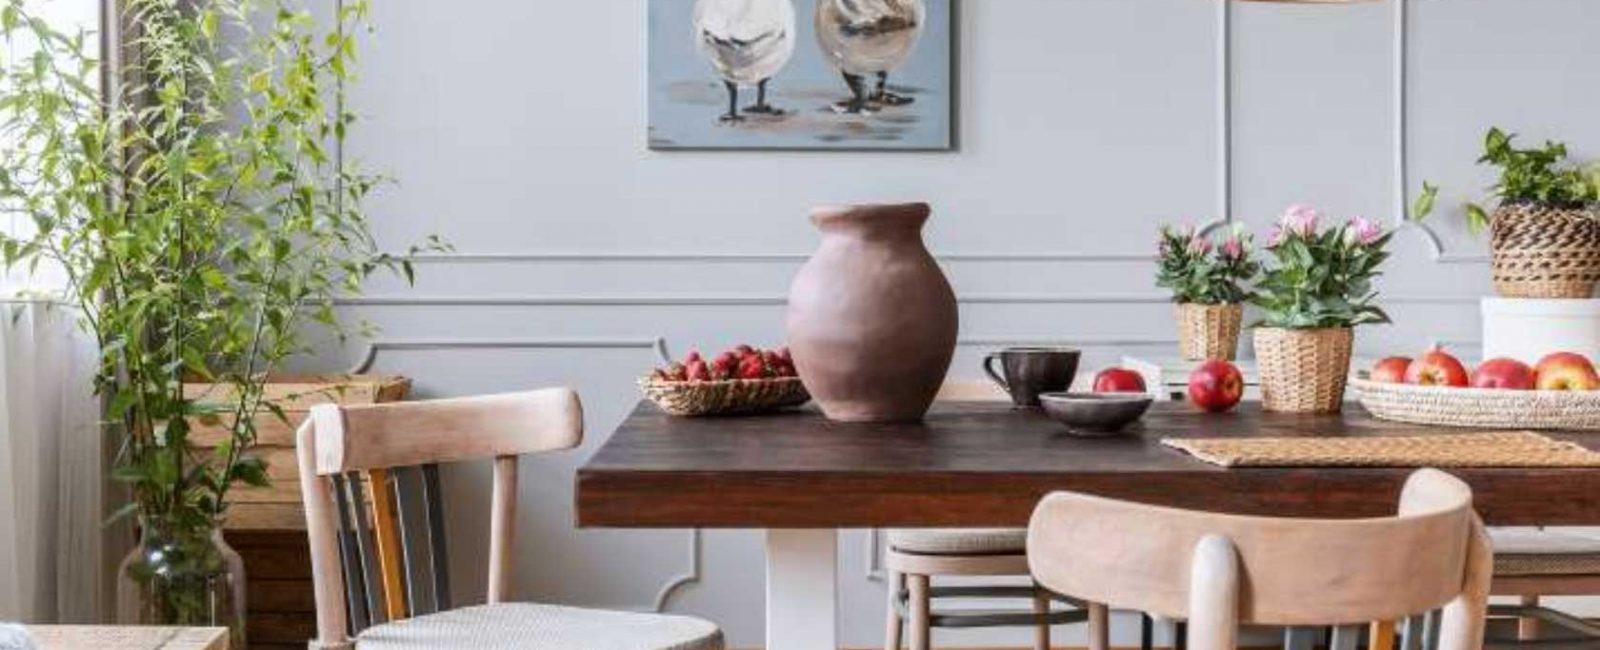 8 Best Unique Pieces to Complement Your Home